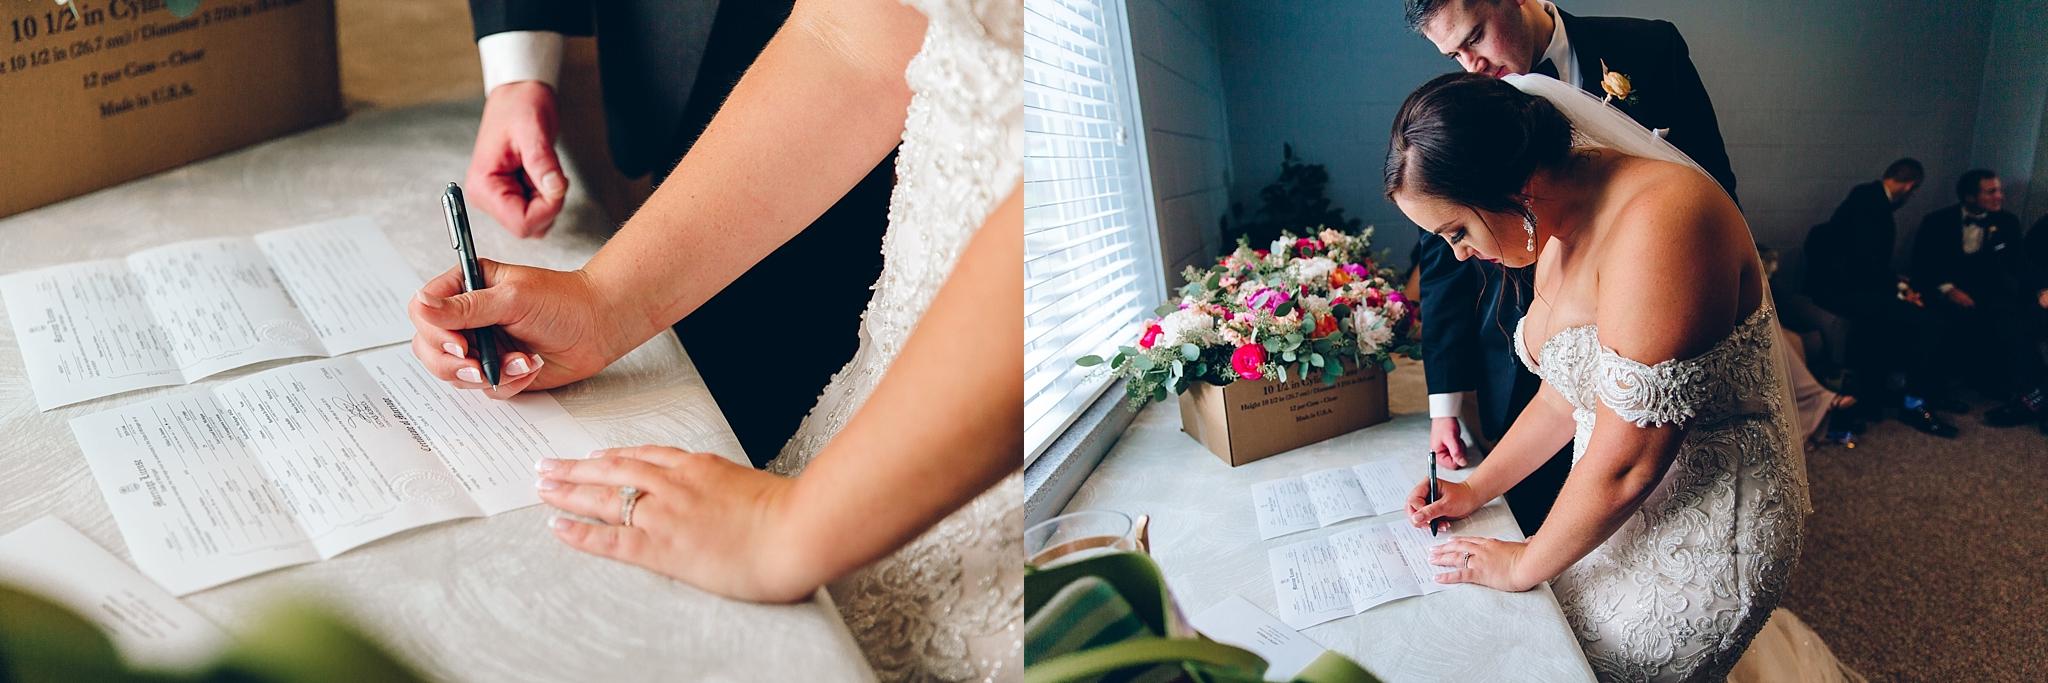 baker-lofts-holland-michigan-wedding-photographer_0361.jpg